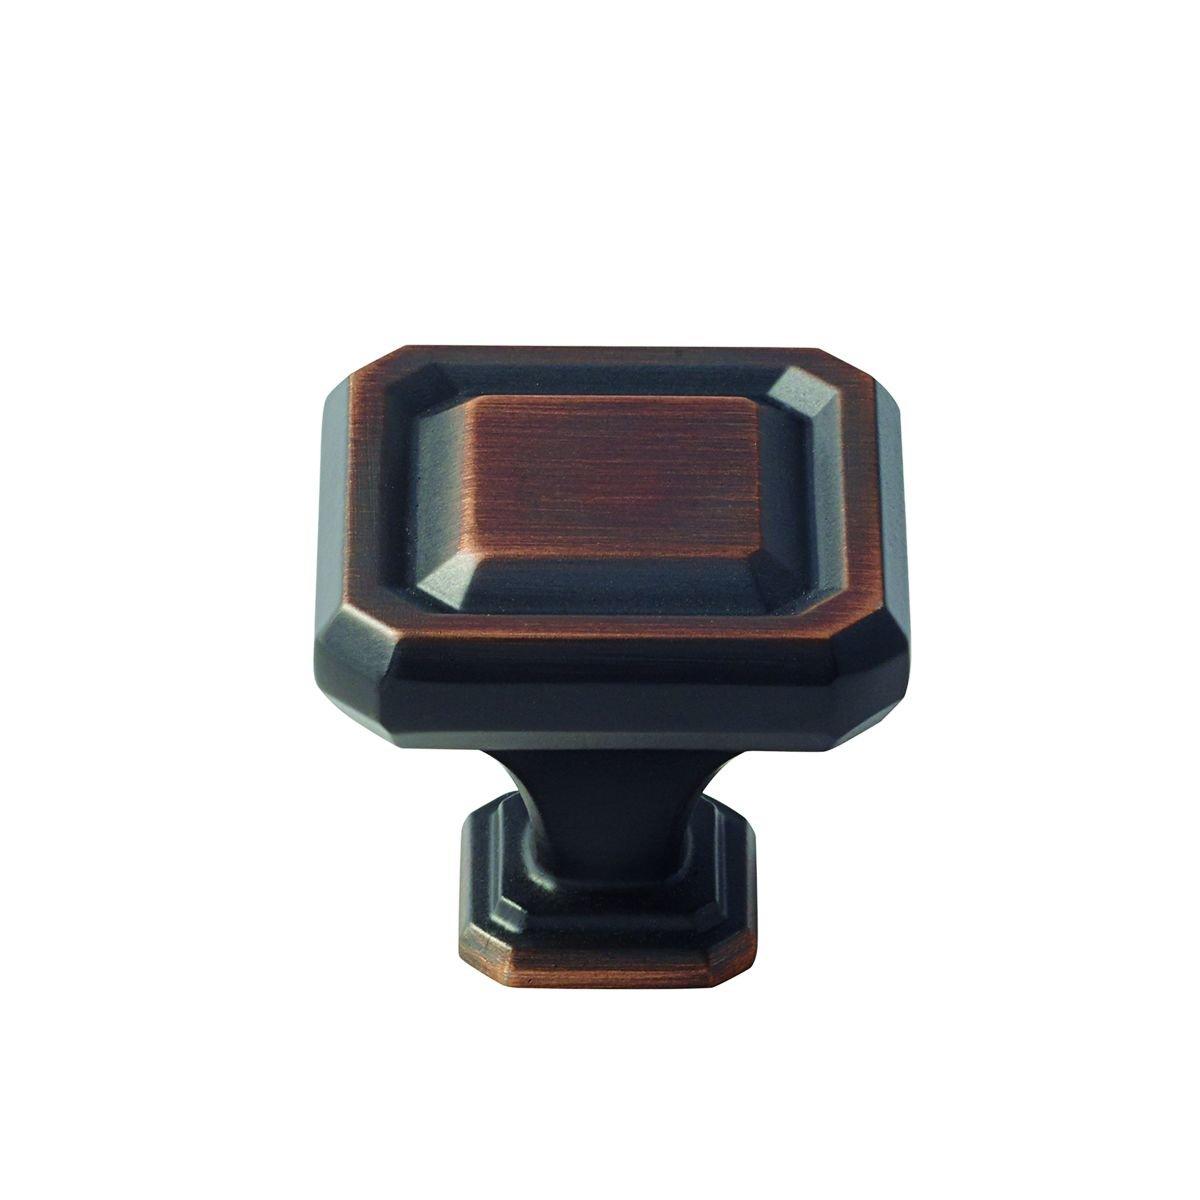 Amerock Bp36547-Orb Knob Wells 1-1/2in Oil Rubbed Bronze